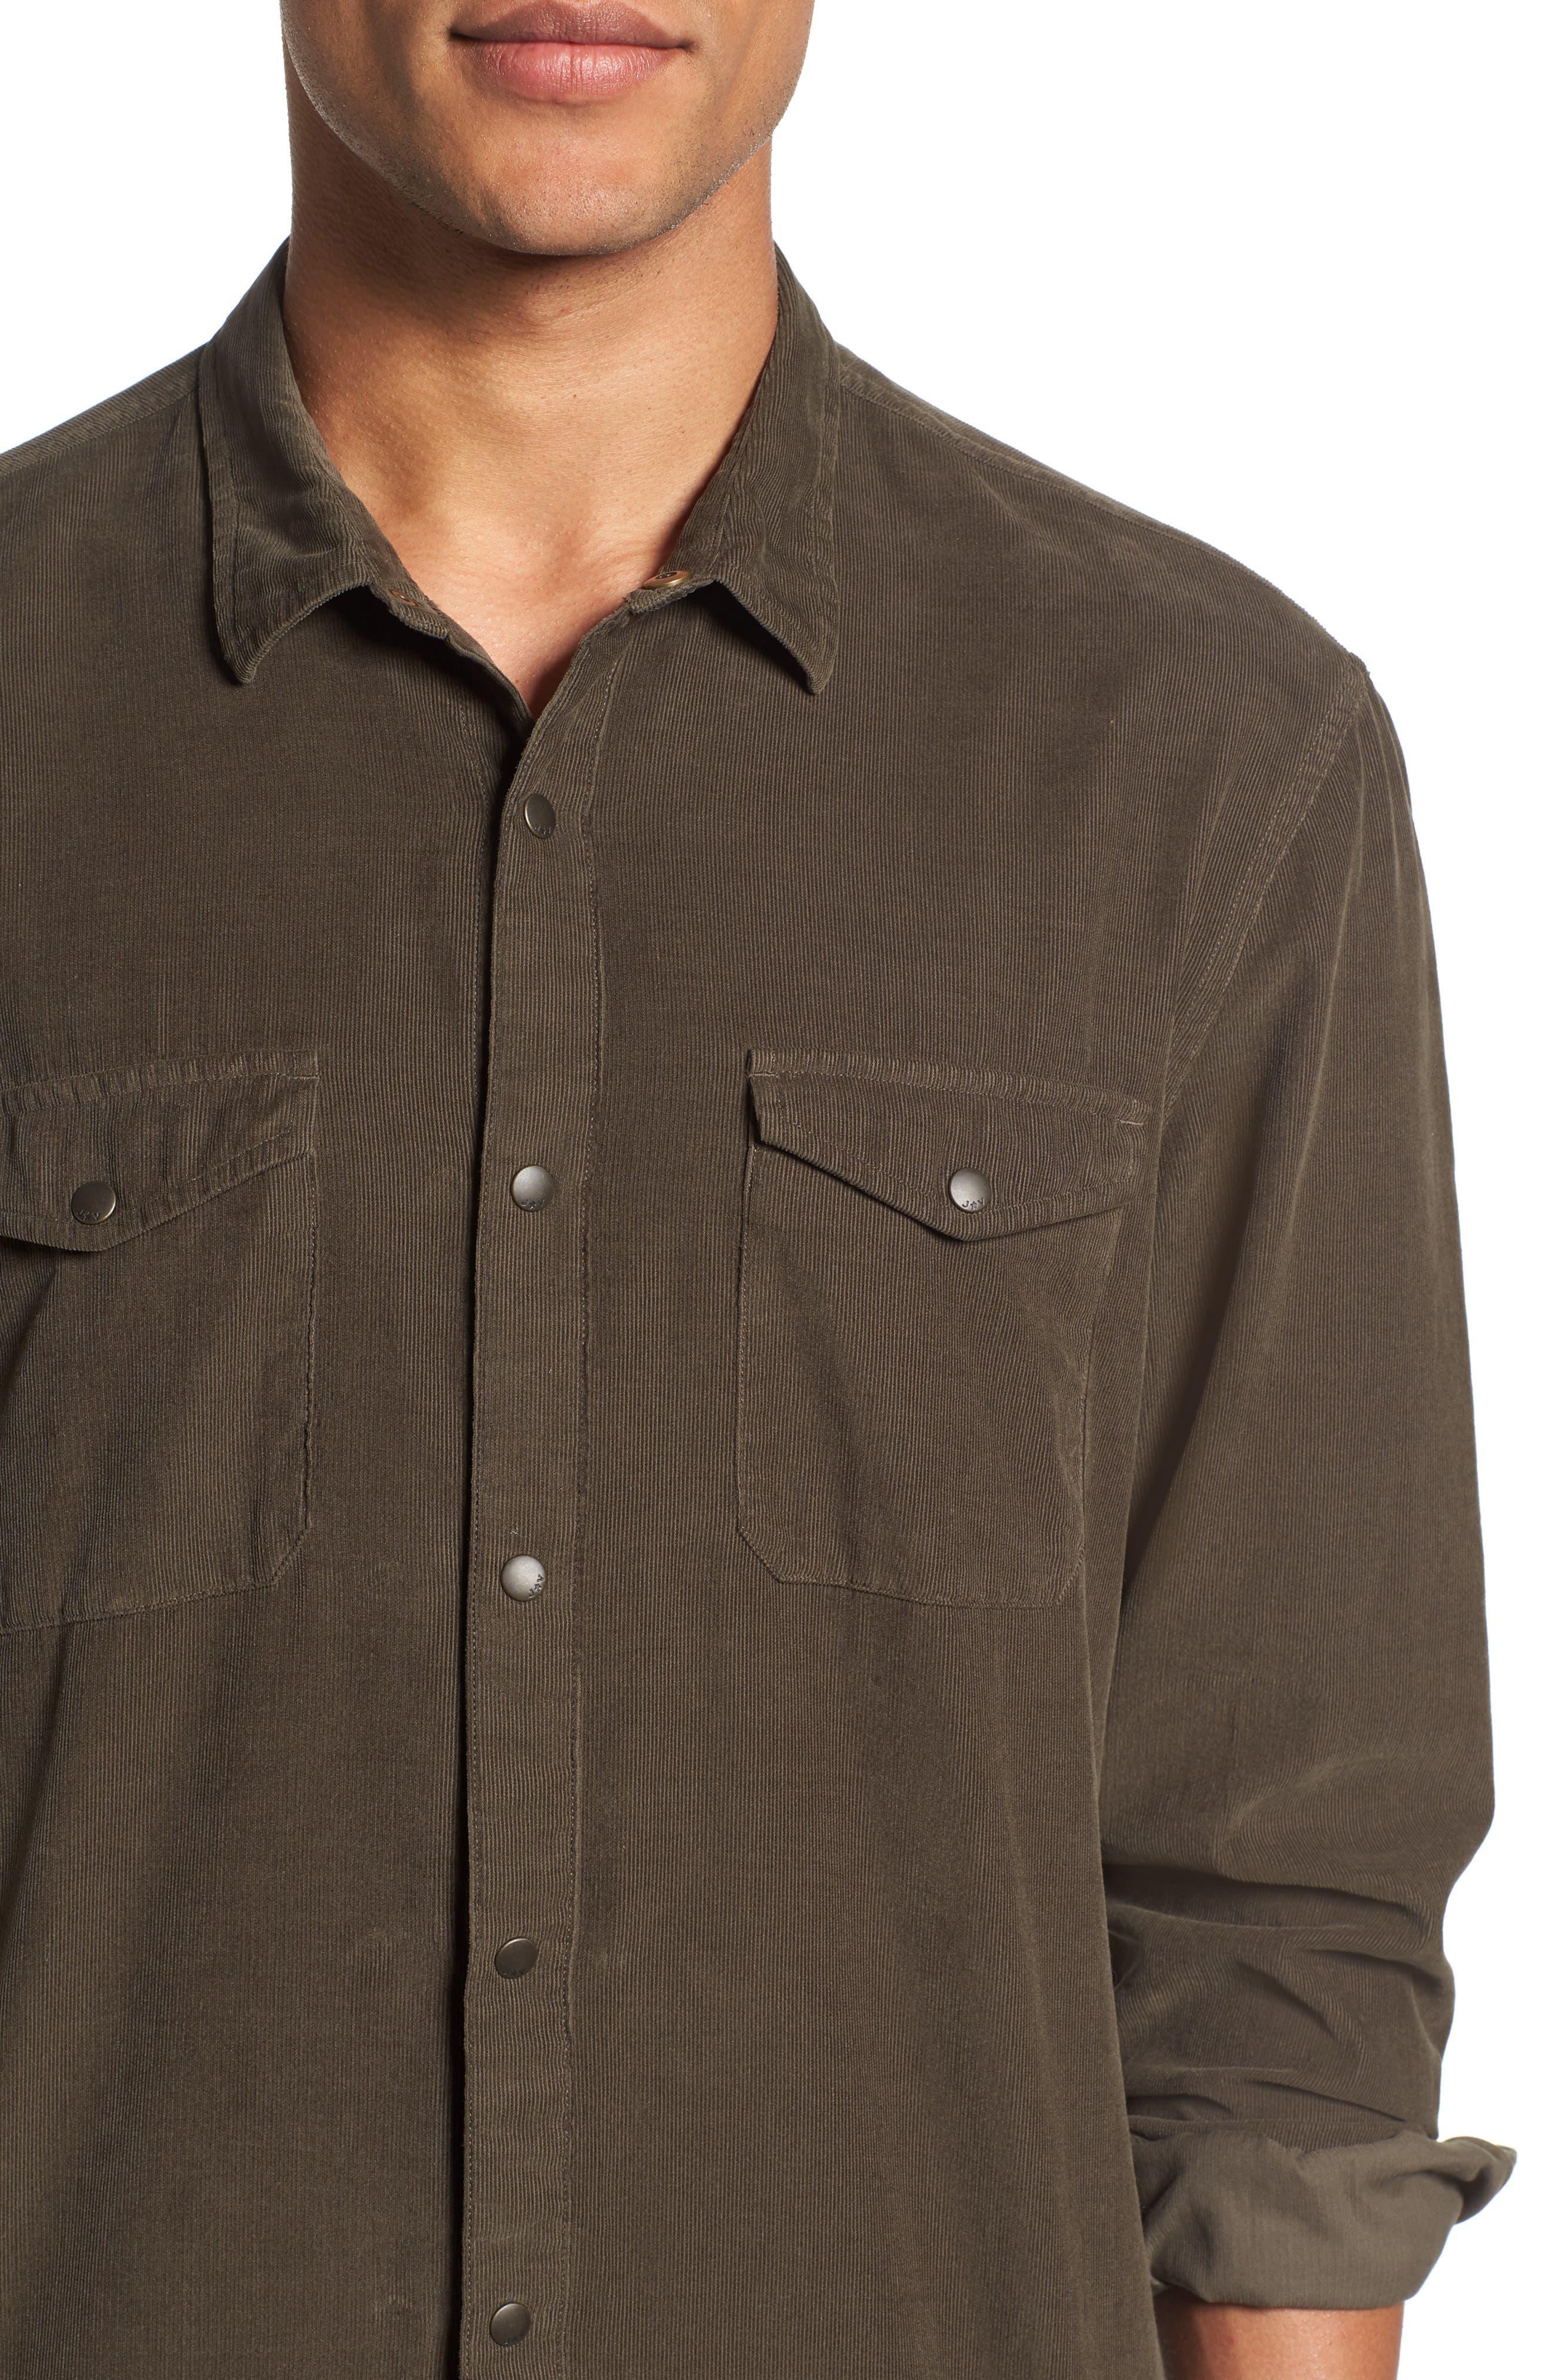 Corduroy Shirt,                             Alternate thumbnail 2, color,                             391